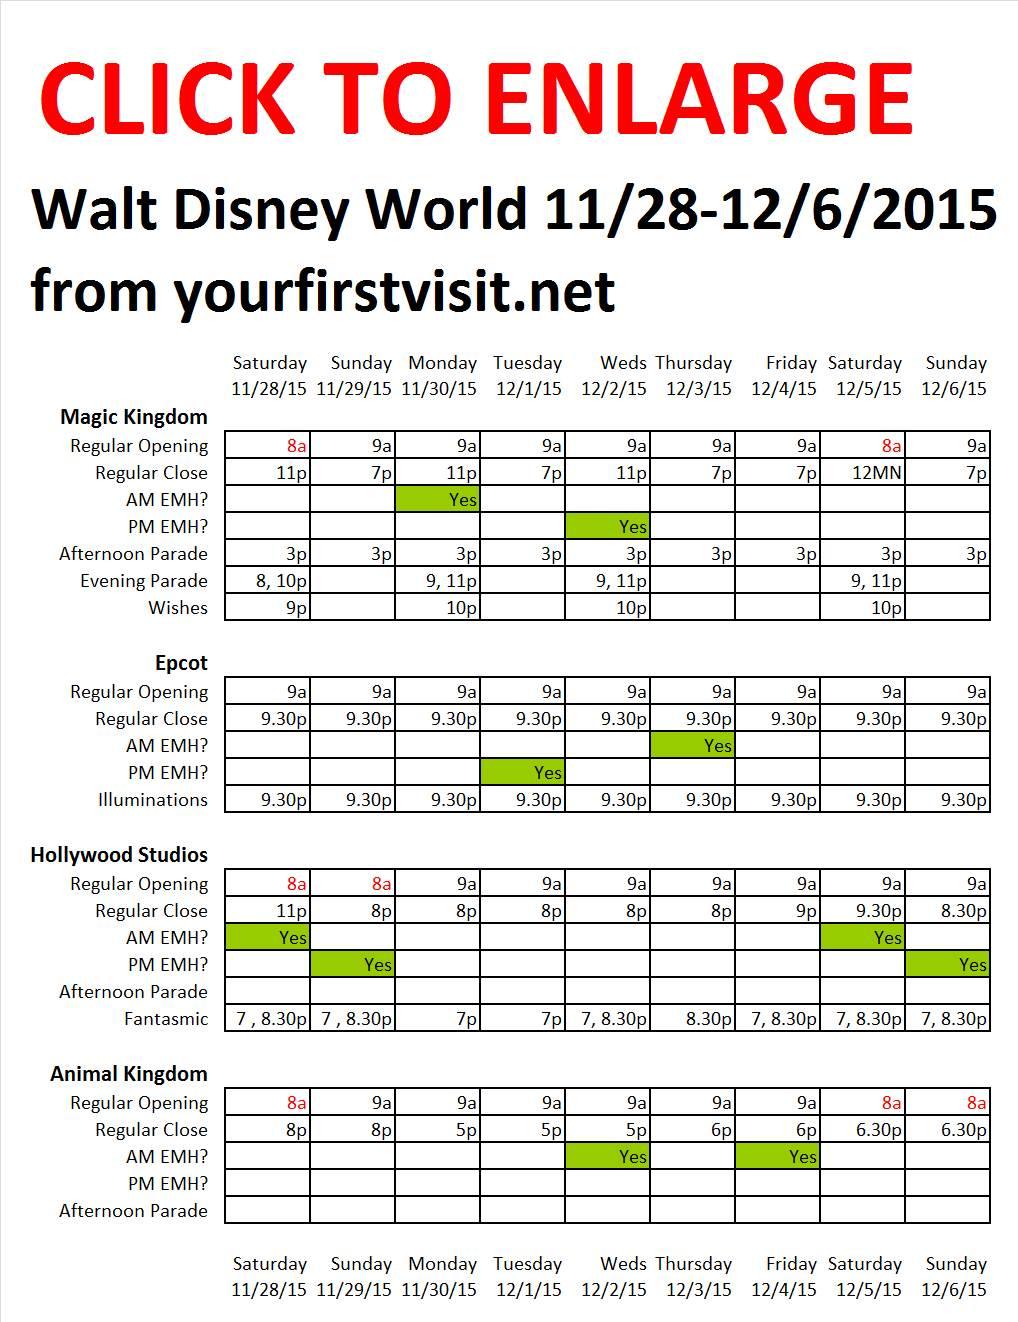 Disney World 11-28 to 12-6-2105 from yourfirstvisit.net